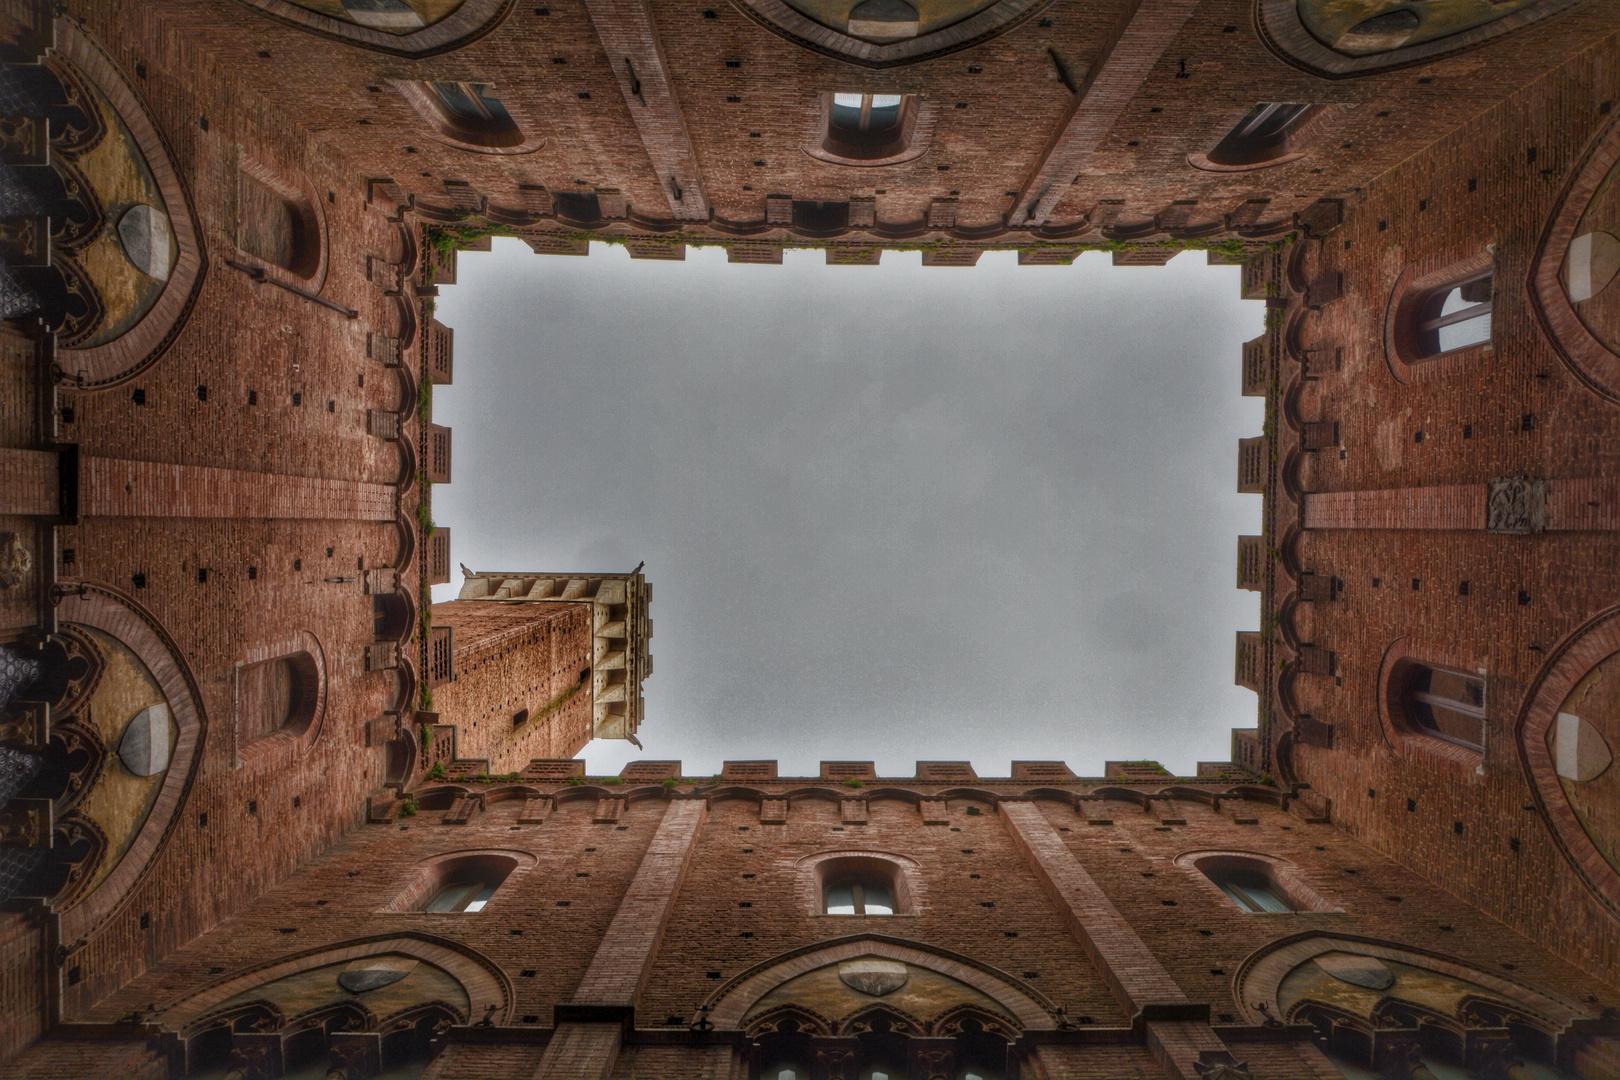 Siena im November